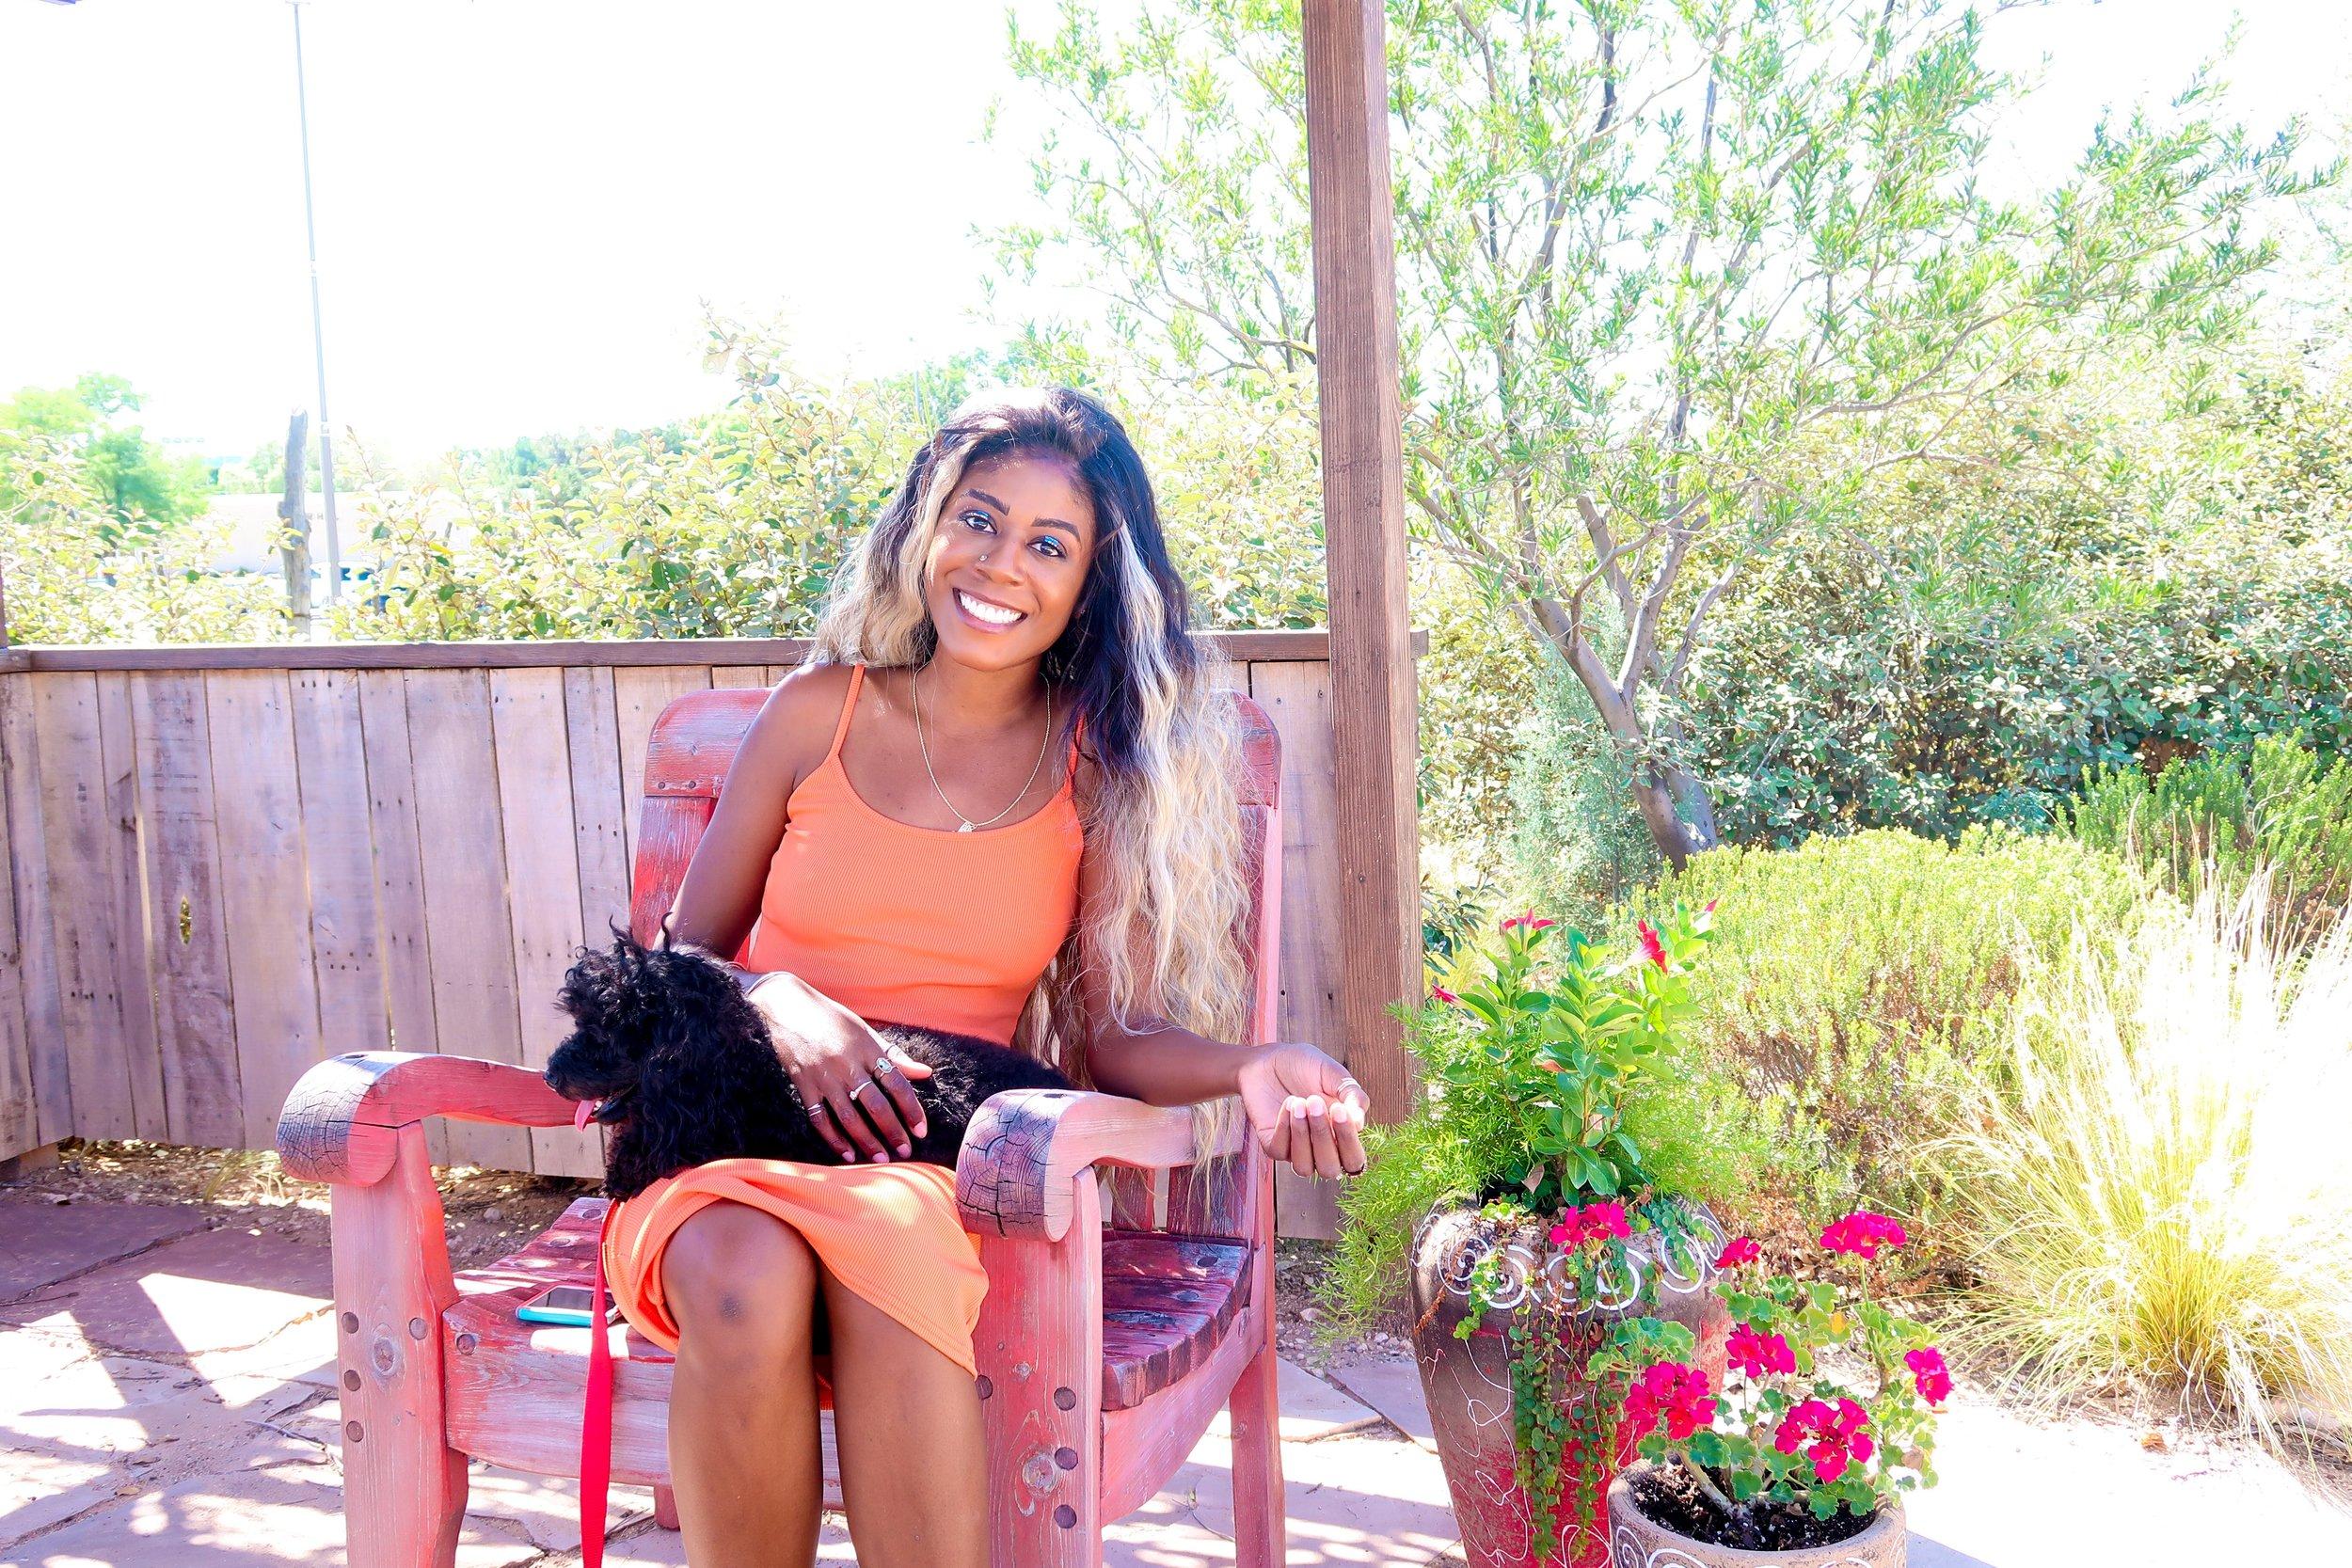 femme luxe finery review Orange Cami Strap Maxi Dress - Serenna.JPEG